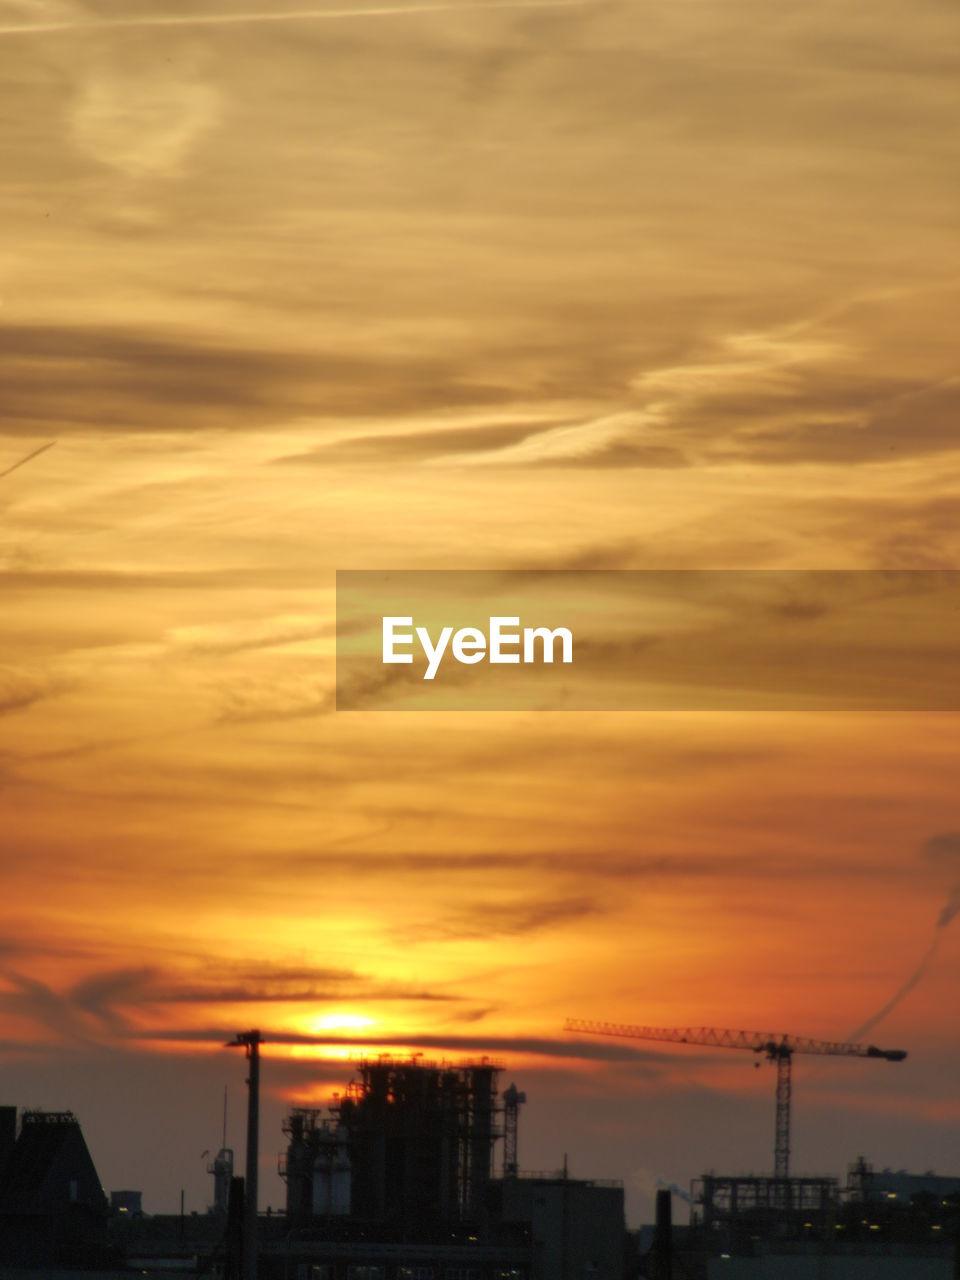 sunset, orange color, sky, cloud - sky, building exterior, architecture, built structure, silhouette, city, no people, cityscape, beauty in nature, nature, outdoors, scenics, travel destinations, modern, urban skyline